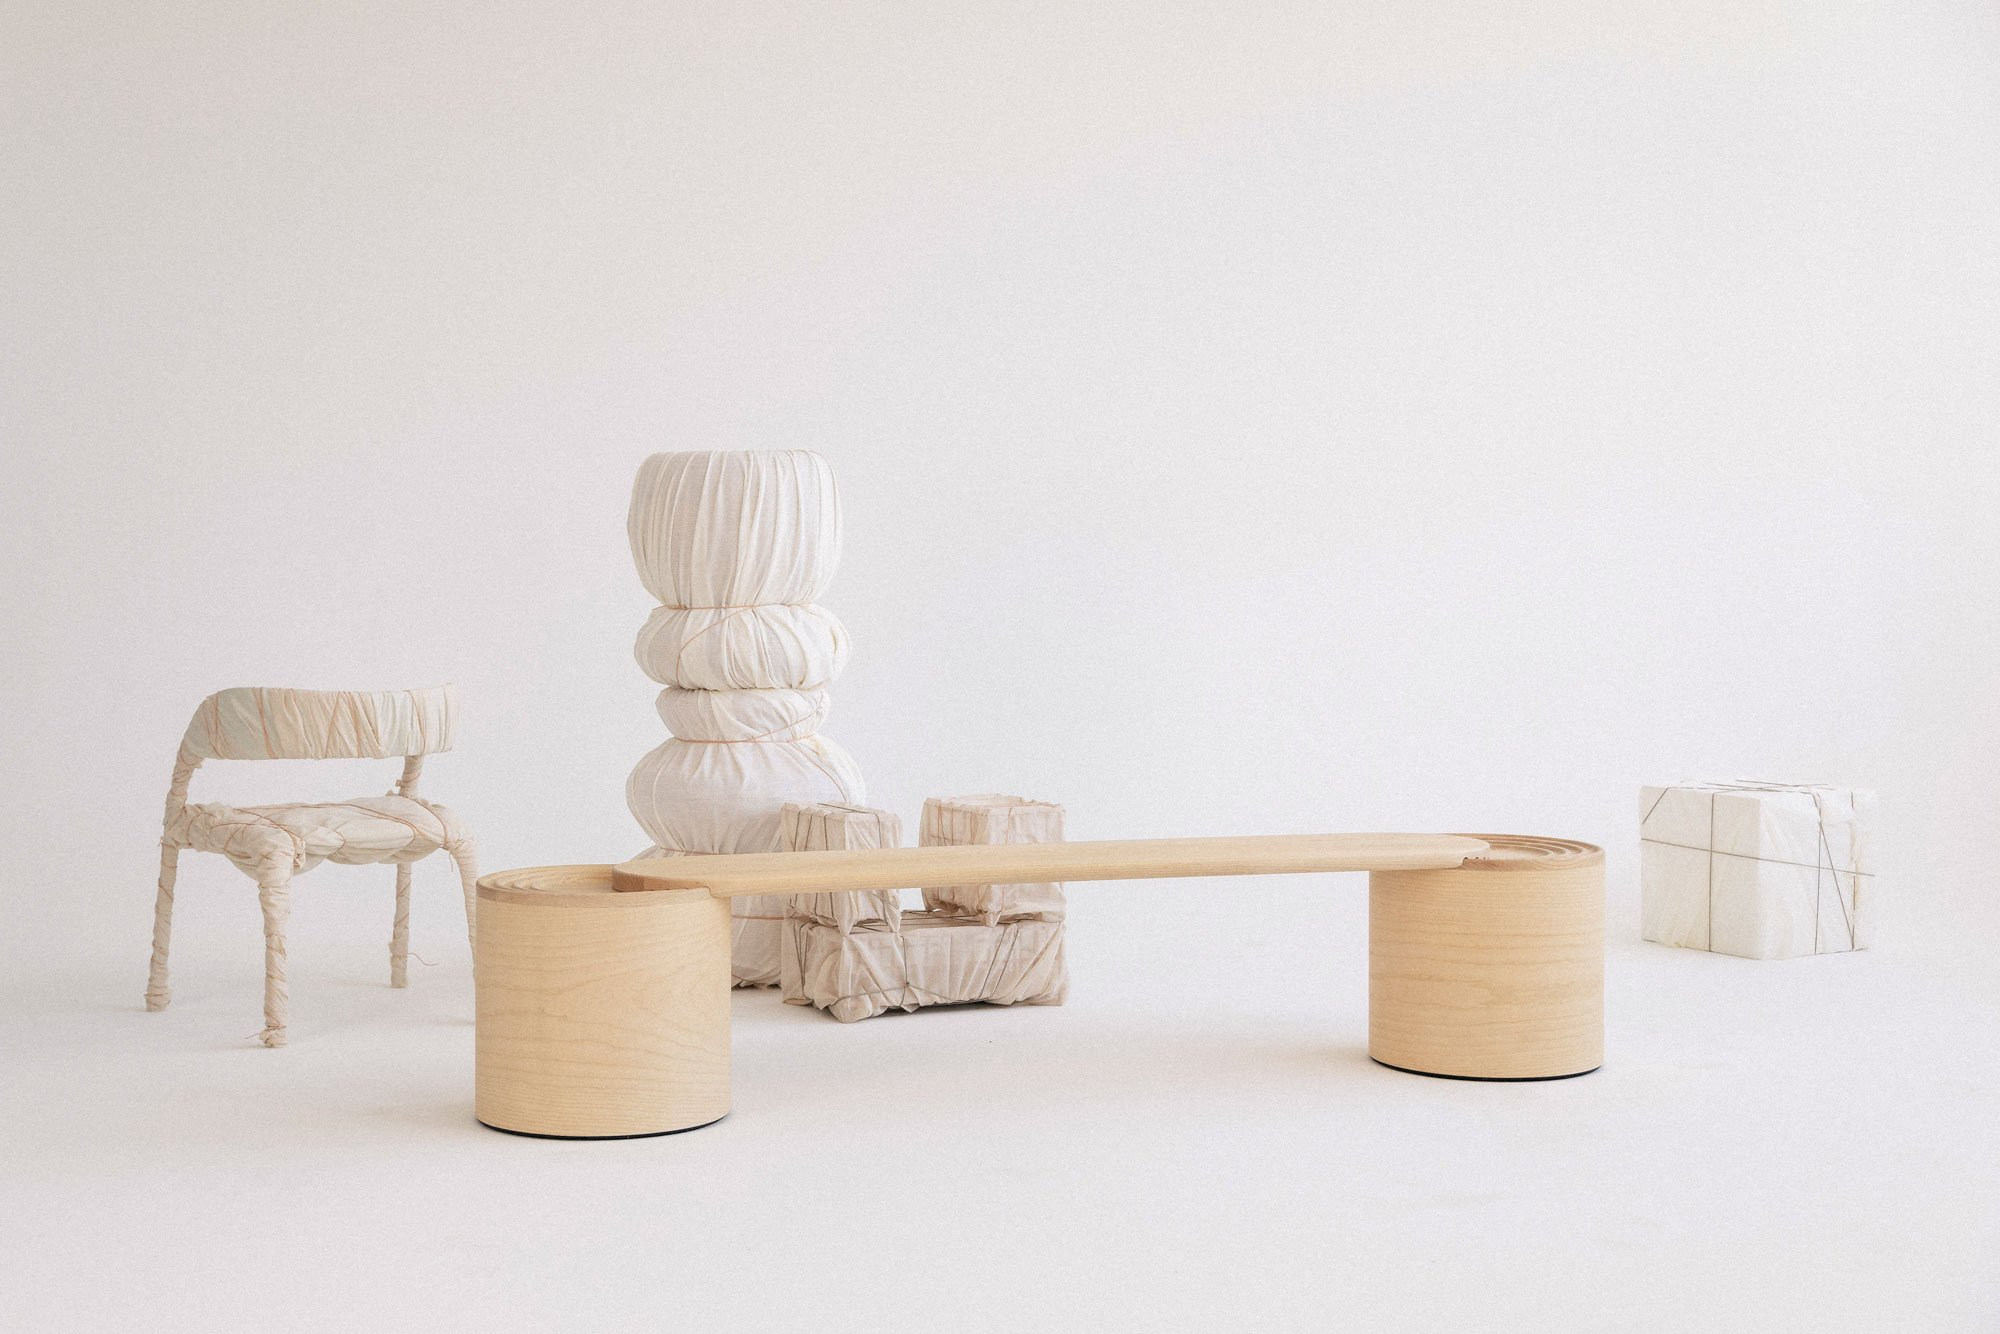 Ukurant Objects, 3daysofdesign 2020, jeunes designers, Kasper Kyster